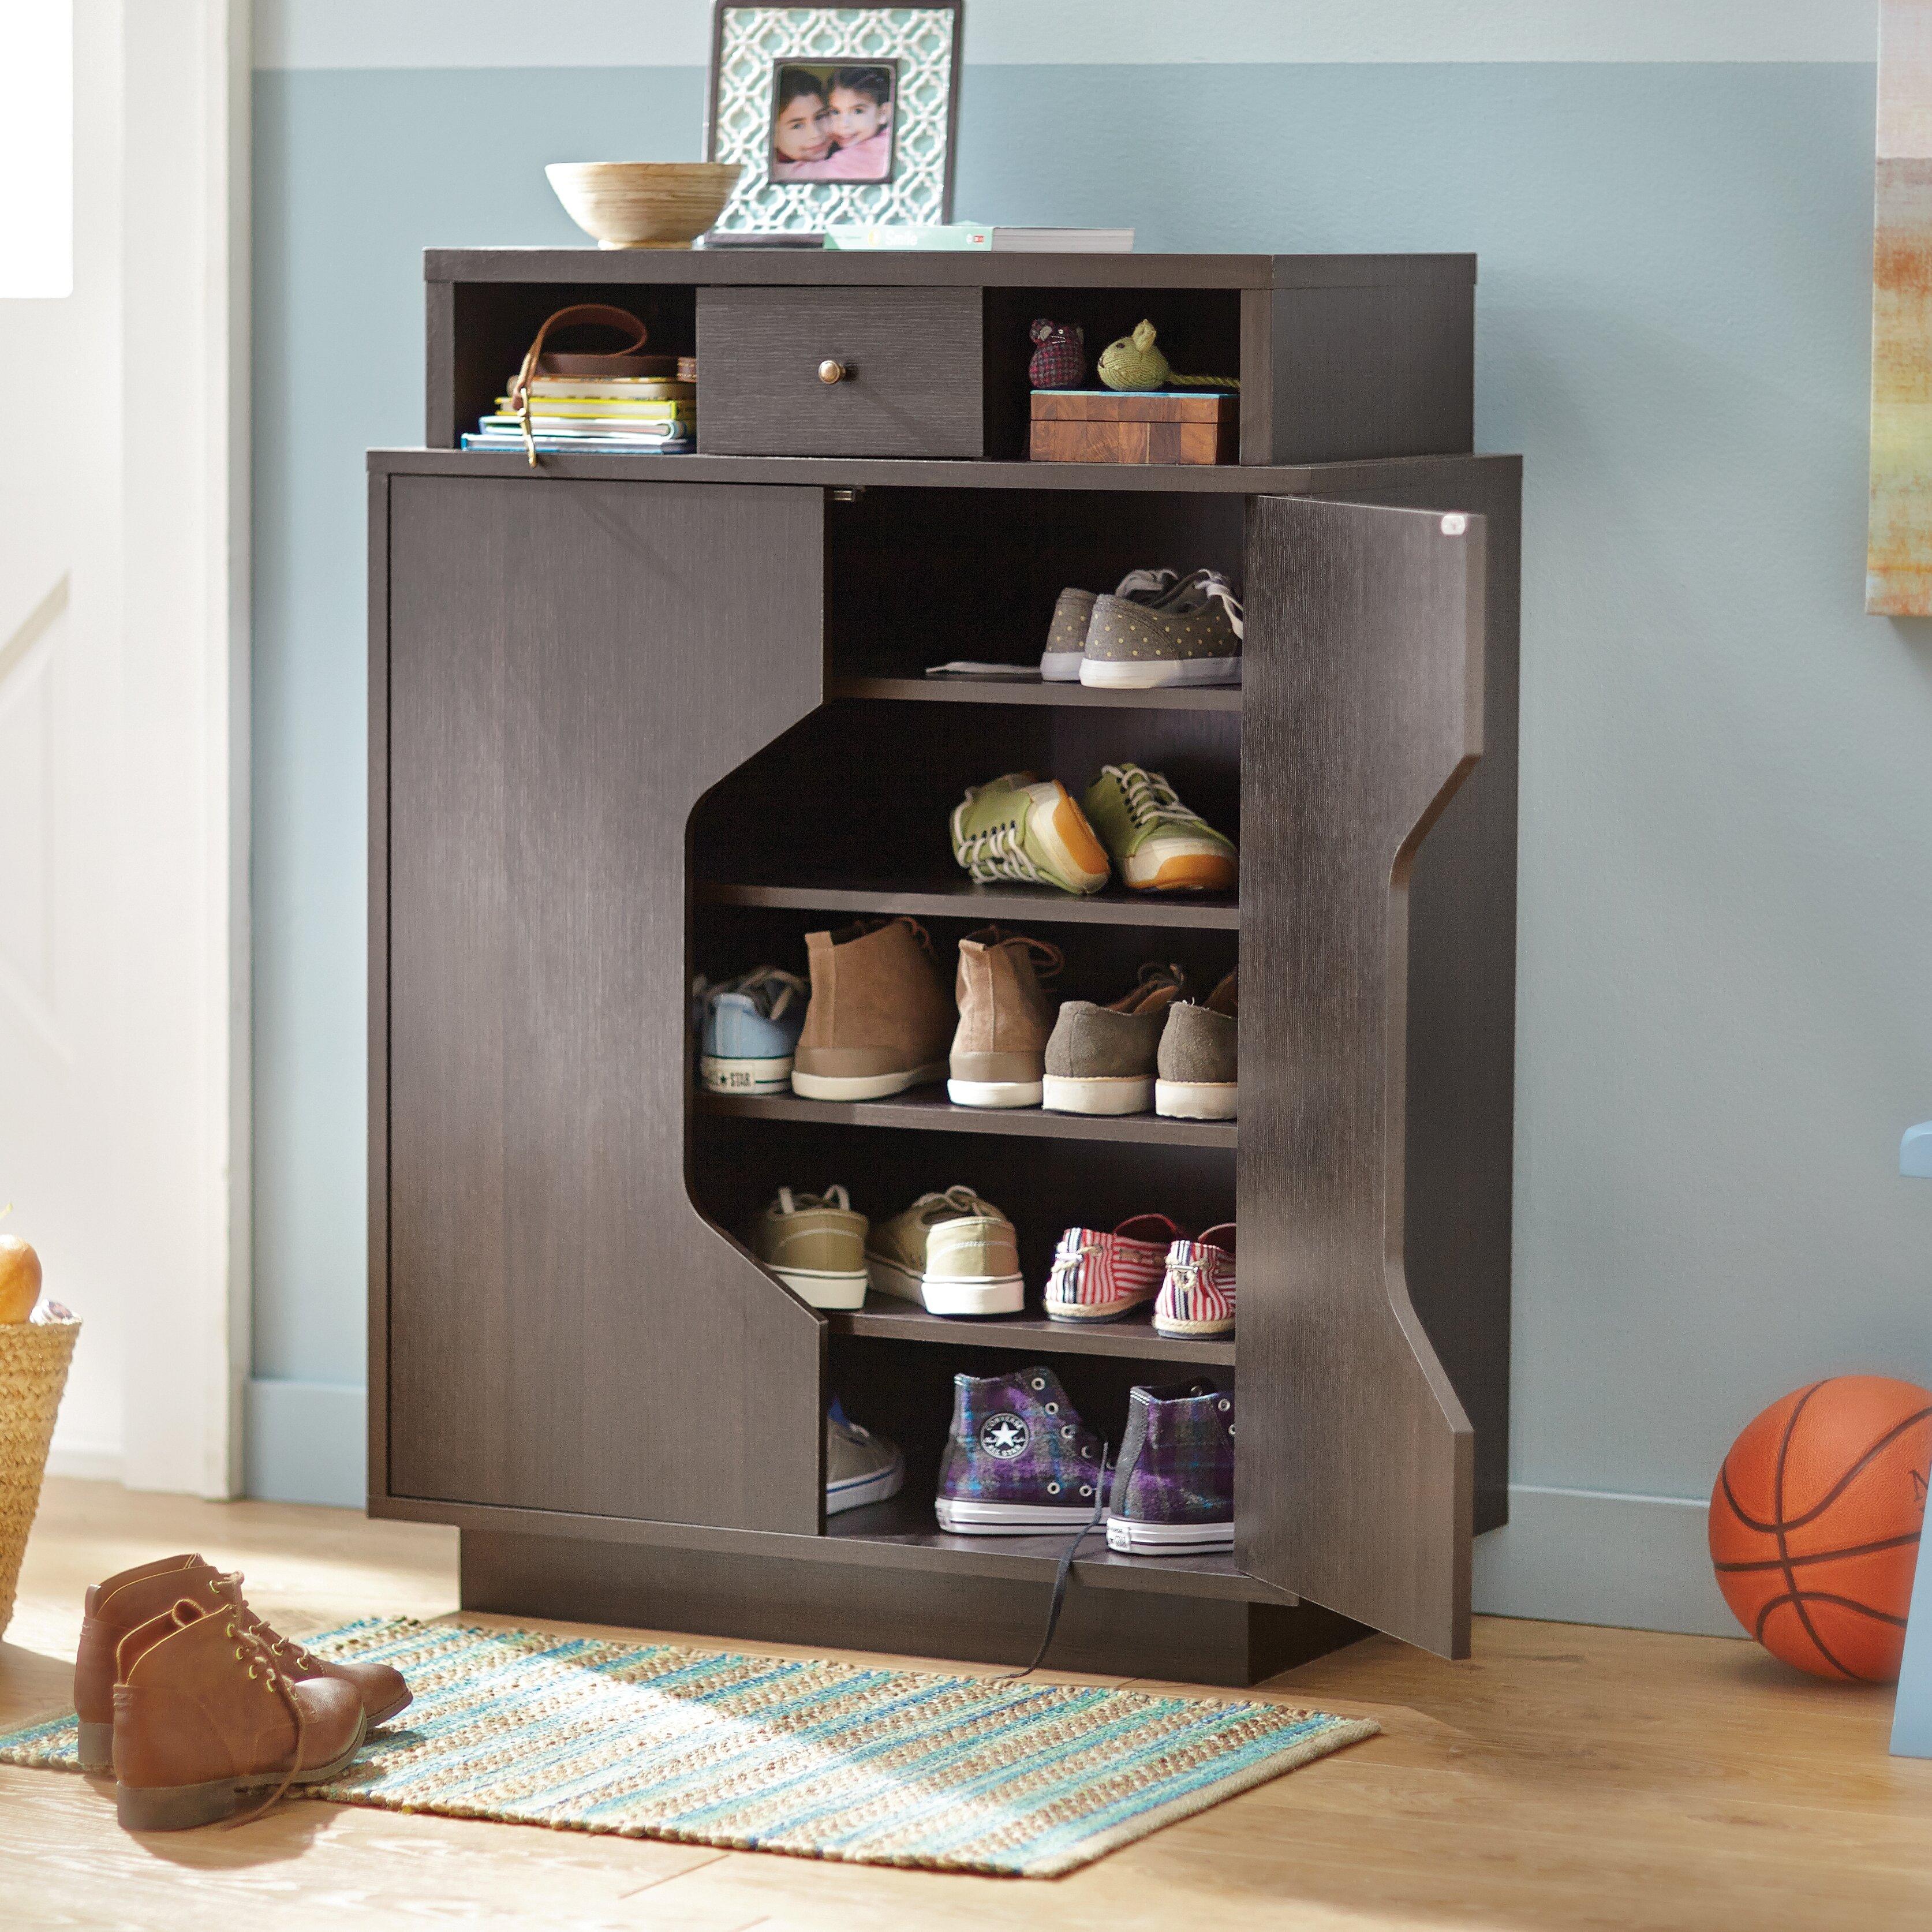 Wade logan redland redline 20 pair shoe storage cabinet reviews wayfair - How to build shoe storage cabinet ...